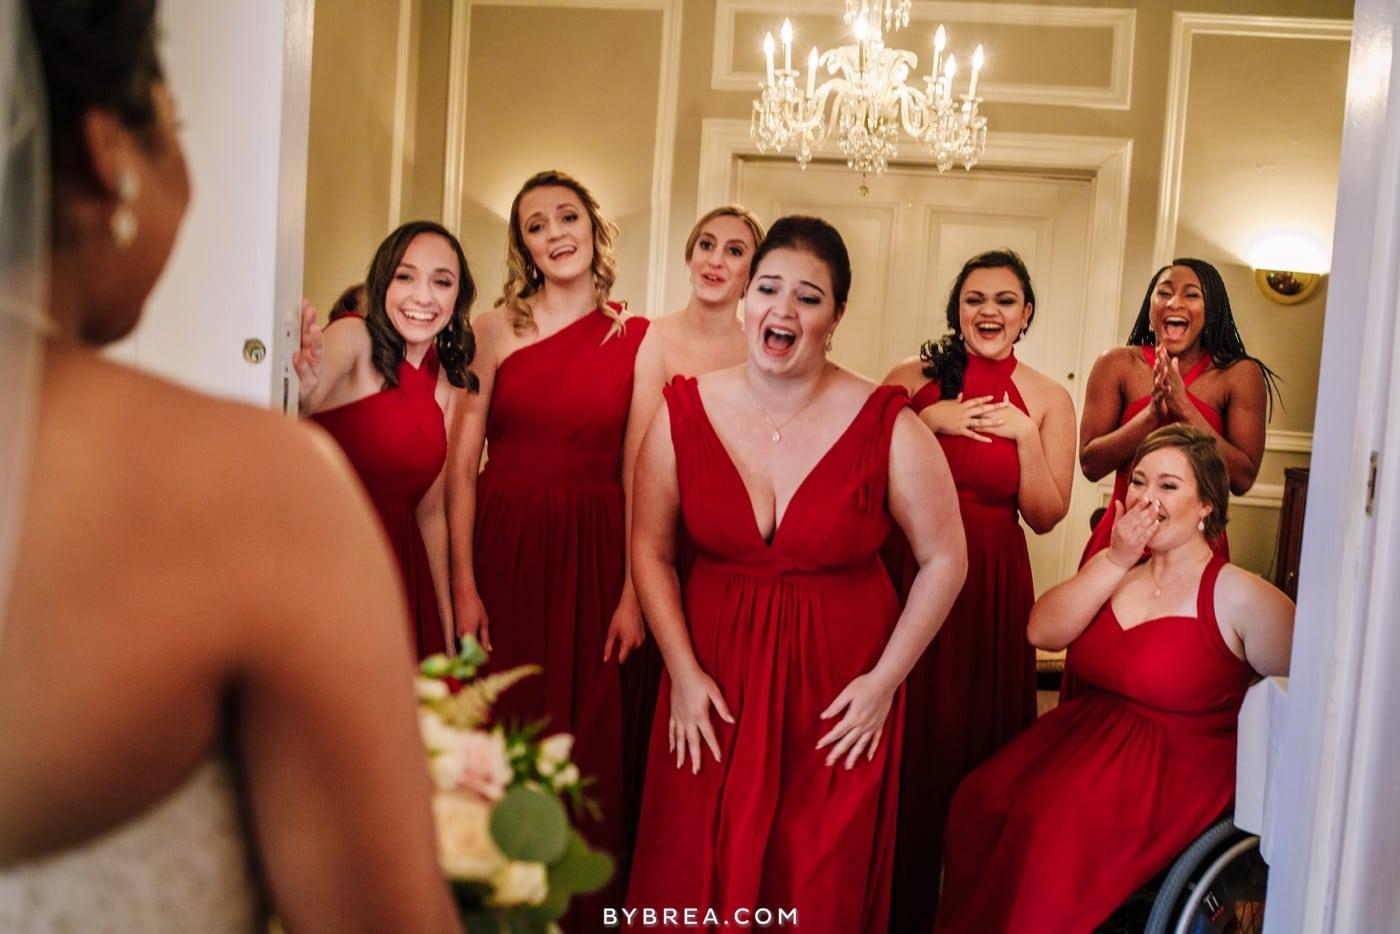 dani-bryce-winter-belvedere-baltimore-wedding-photos_0039